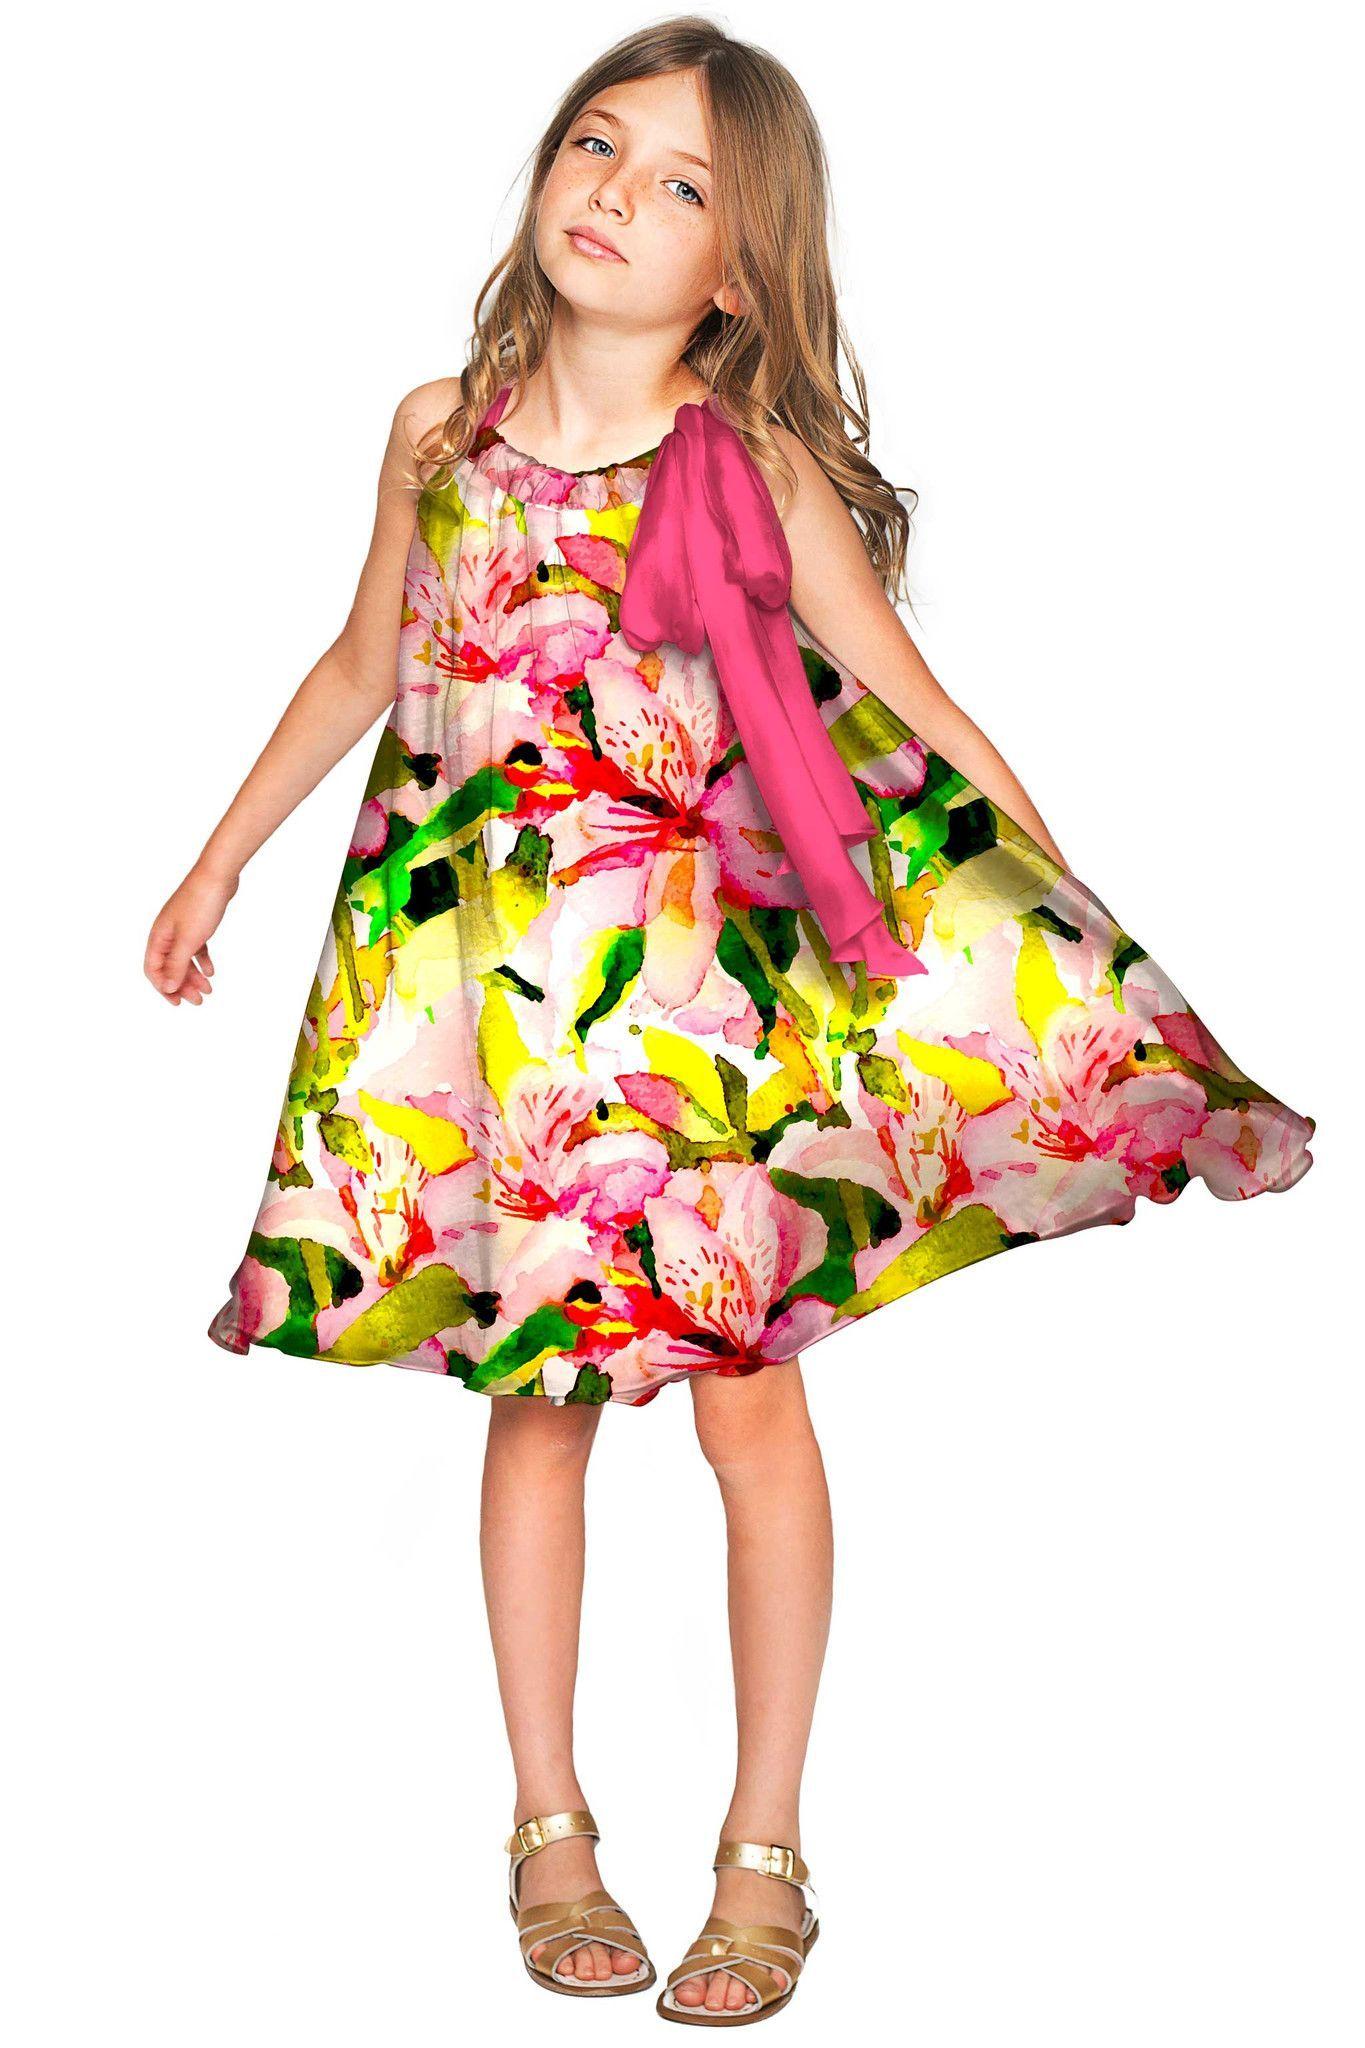 ea2f7b11e435 Havana Flash Melody Chiffon Fancy Floral Dress - Girls